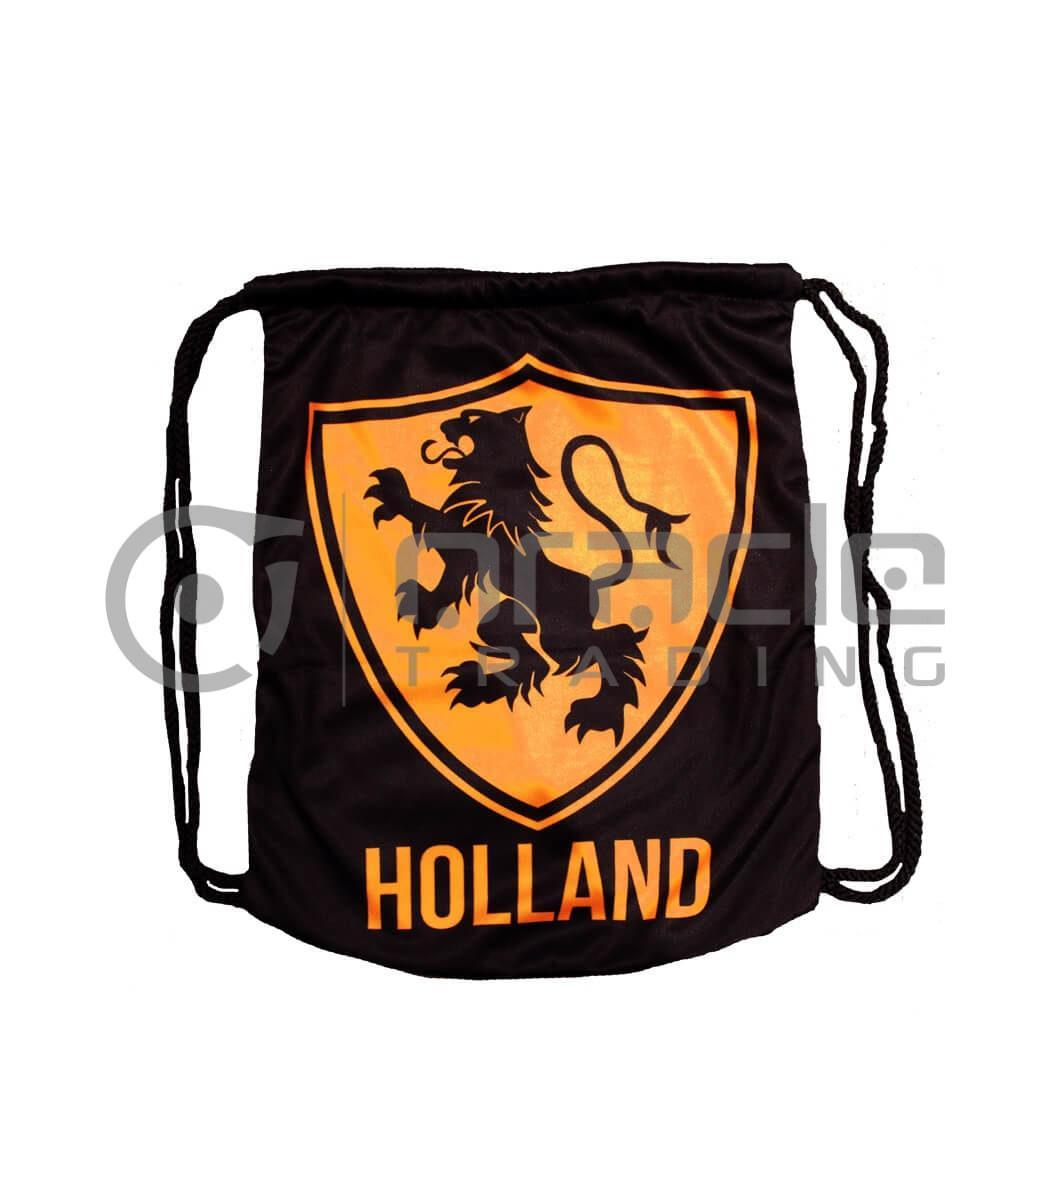 Holland Gym Bag